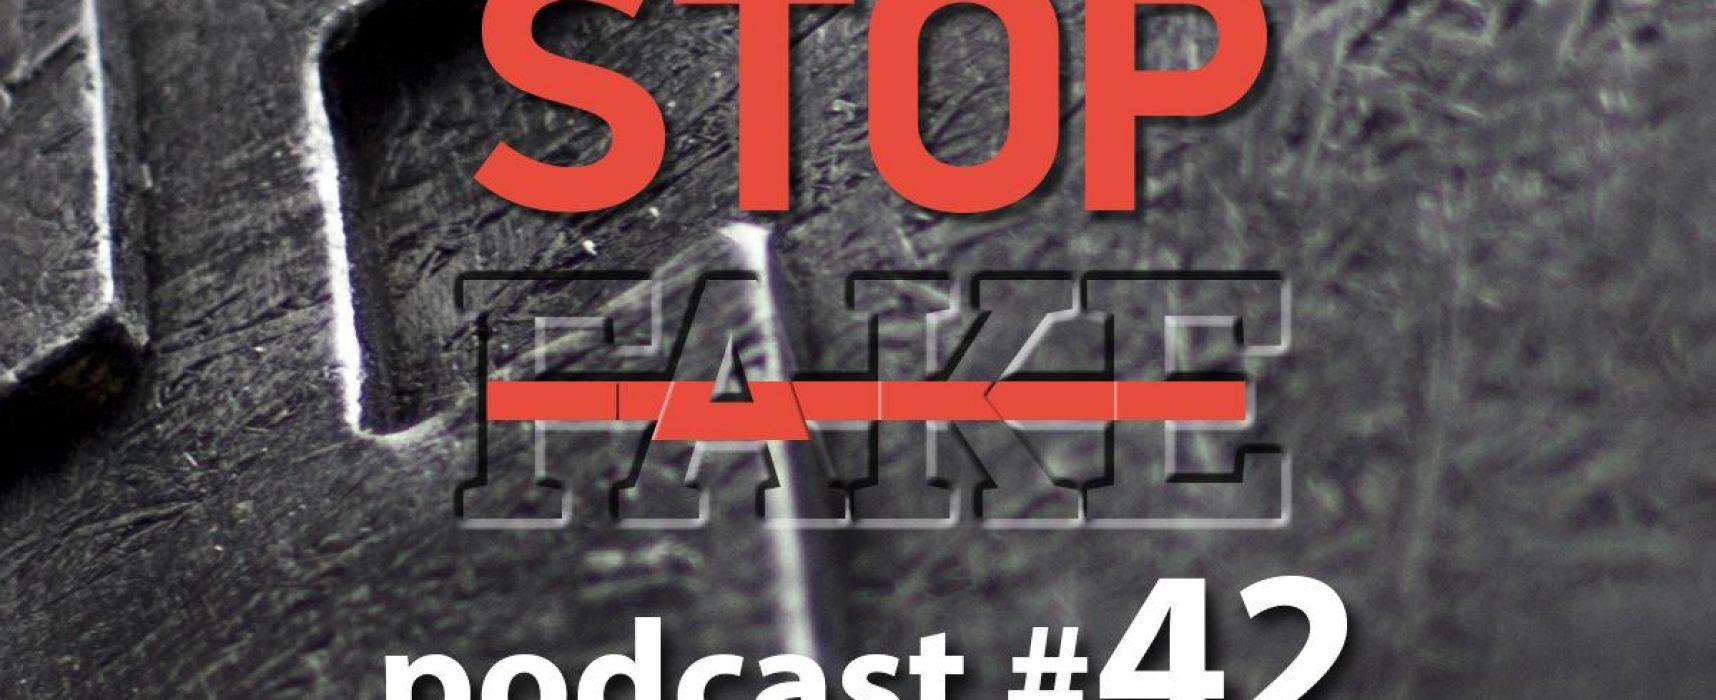 StopFake podcast #42